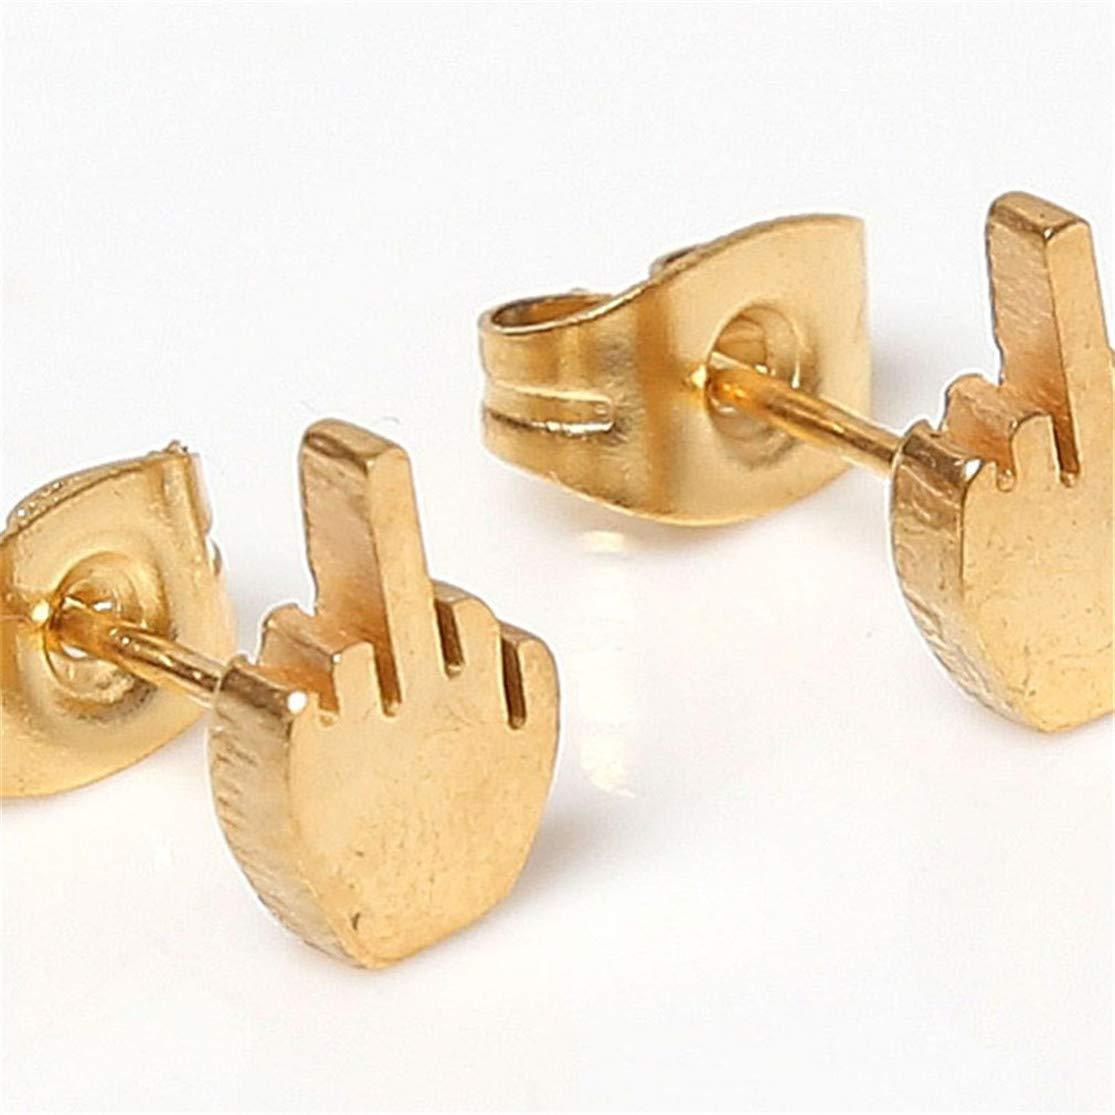 YUGEHLK Punk Stainless Steel Middle Finger Stud Barbell Ear Helix Cartilage Studs Bars Earring Piercing 1 pair black